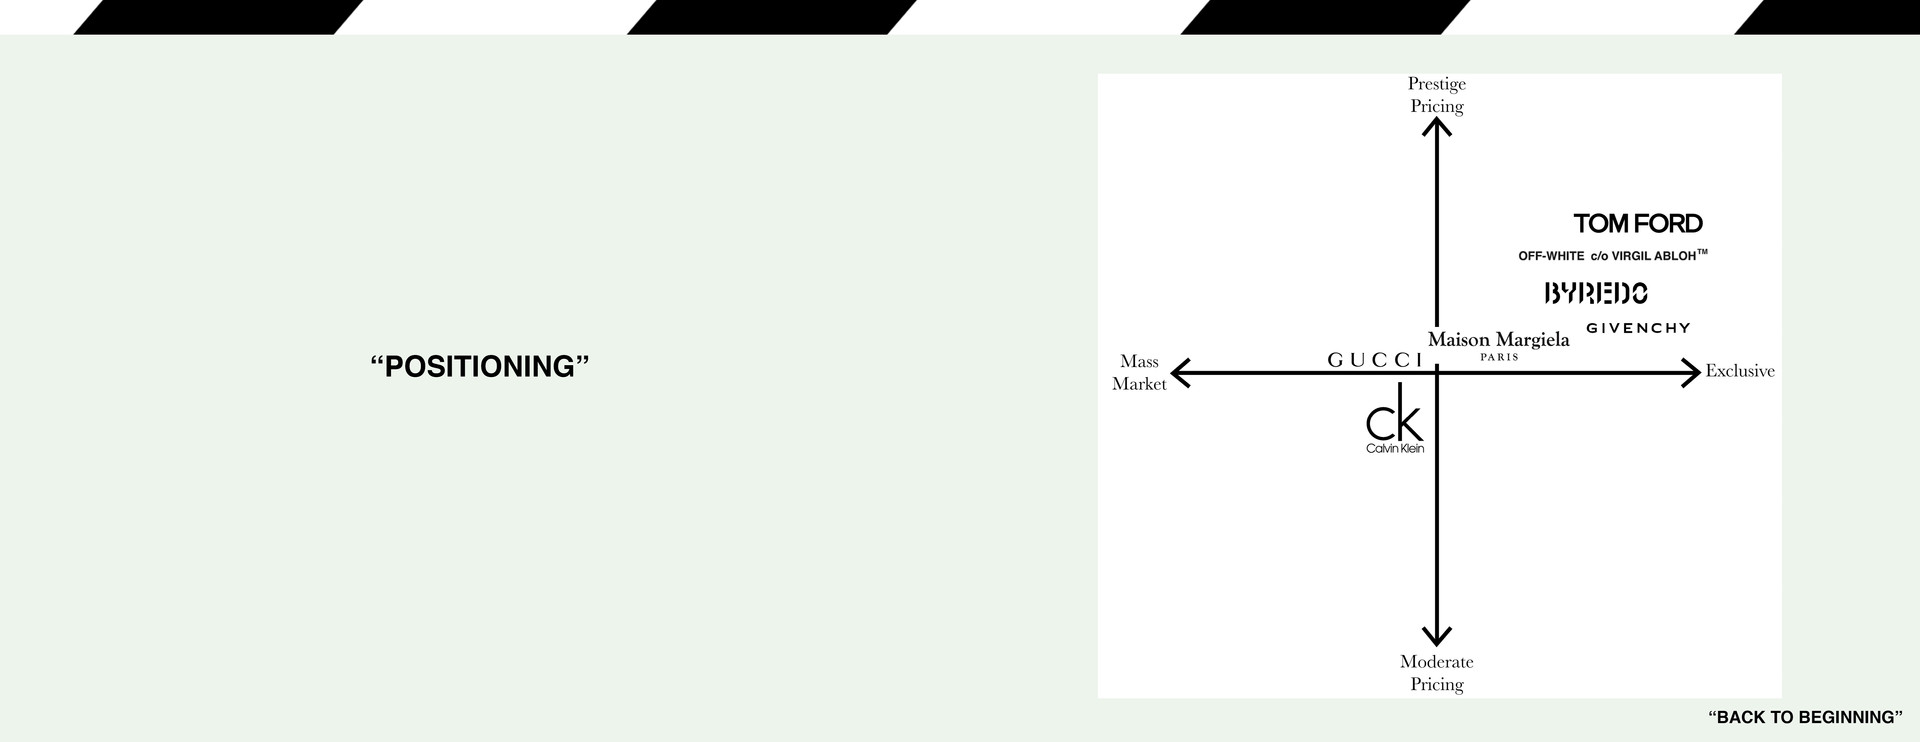 Off_White_Process_int8.jpg